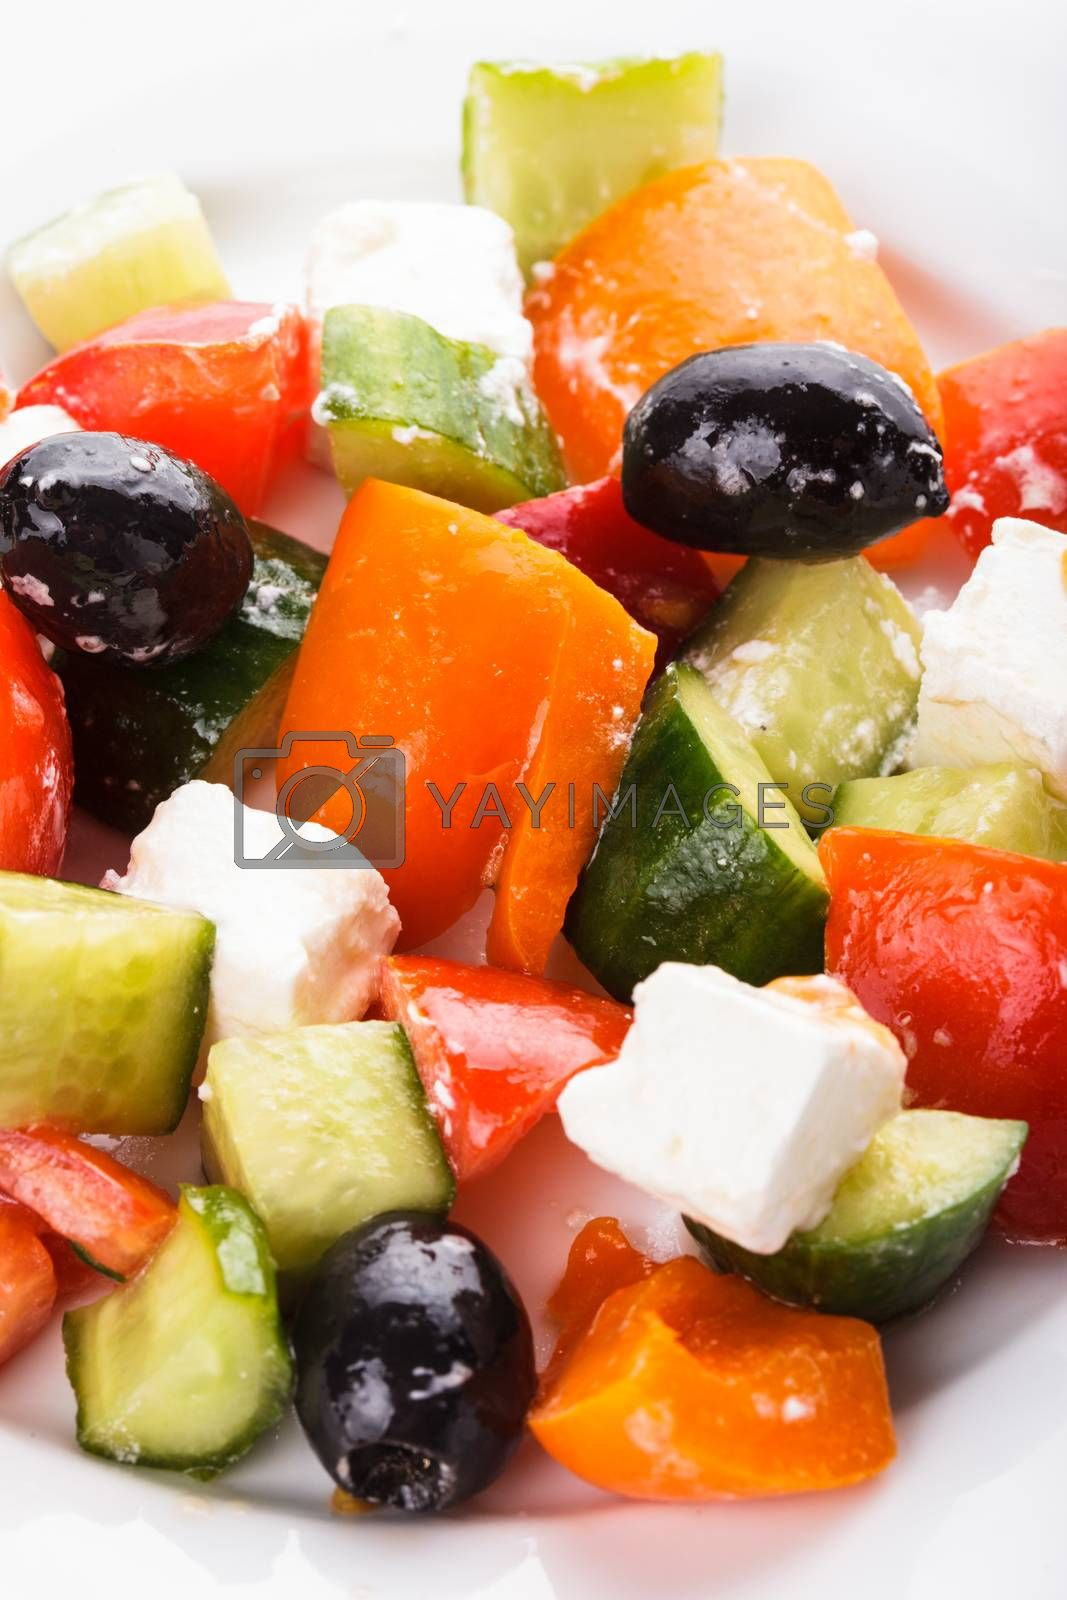 Greek salad with feta cheese macro on white plate